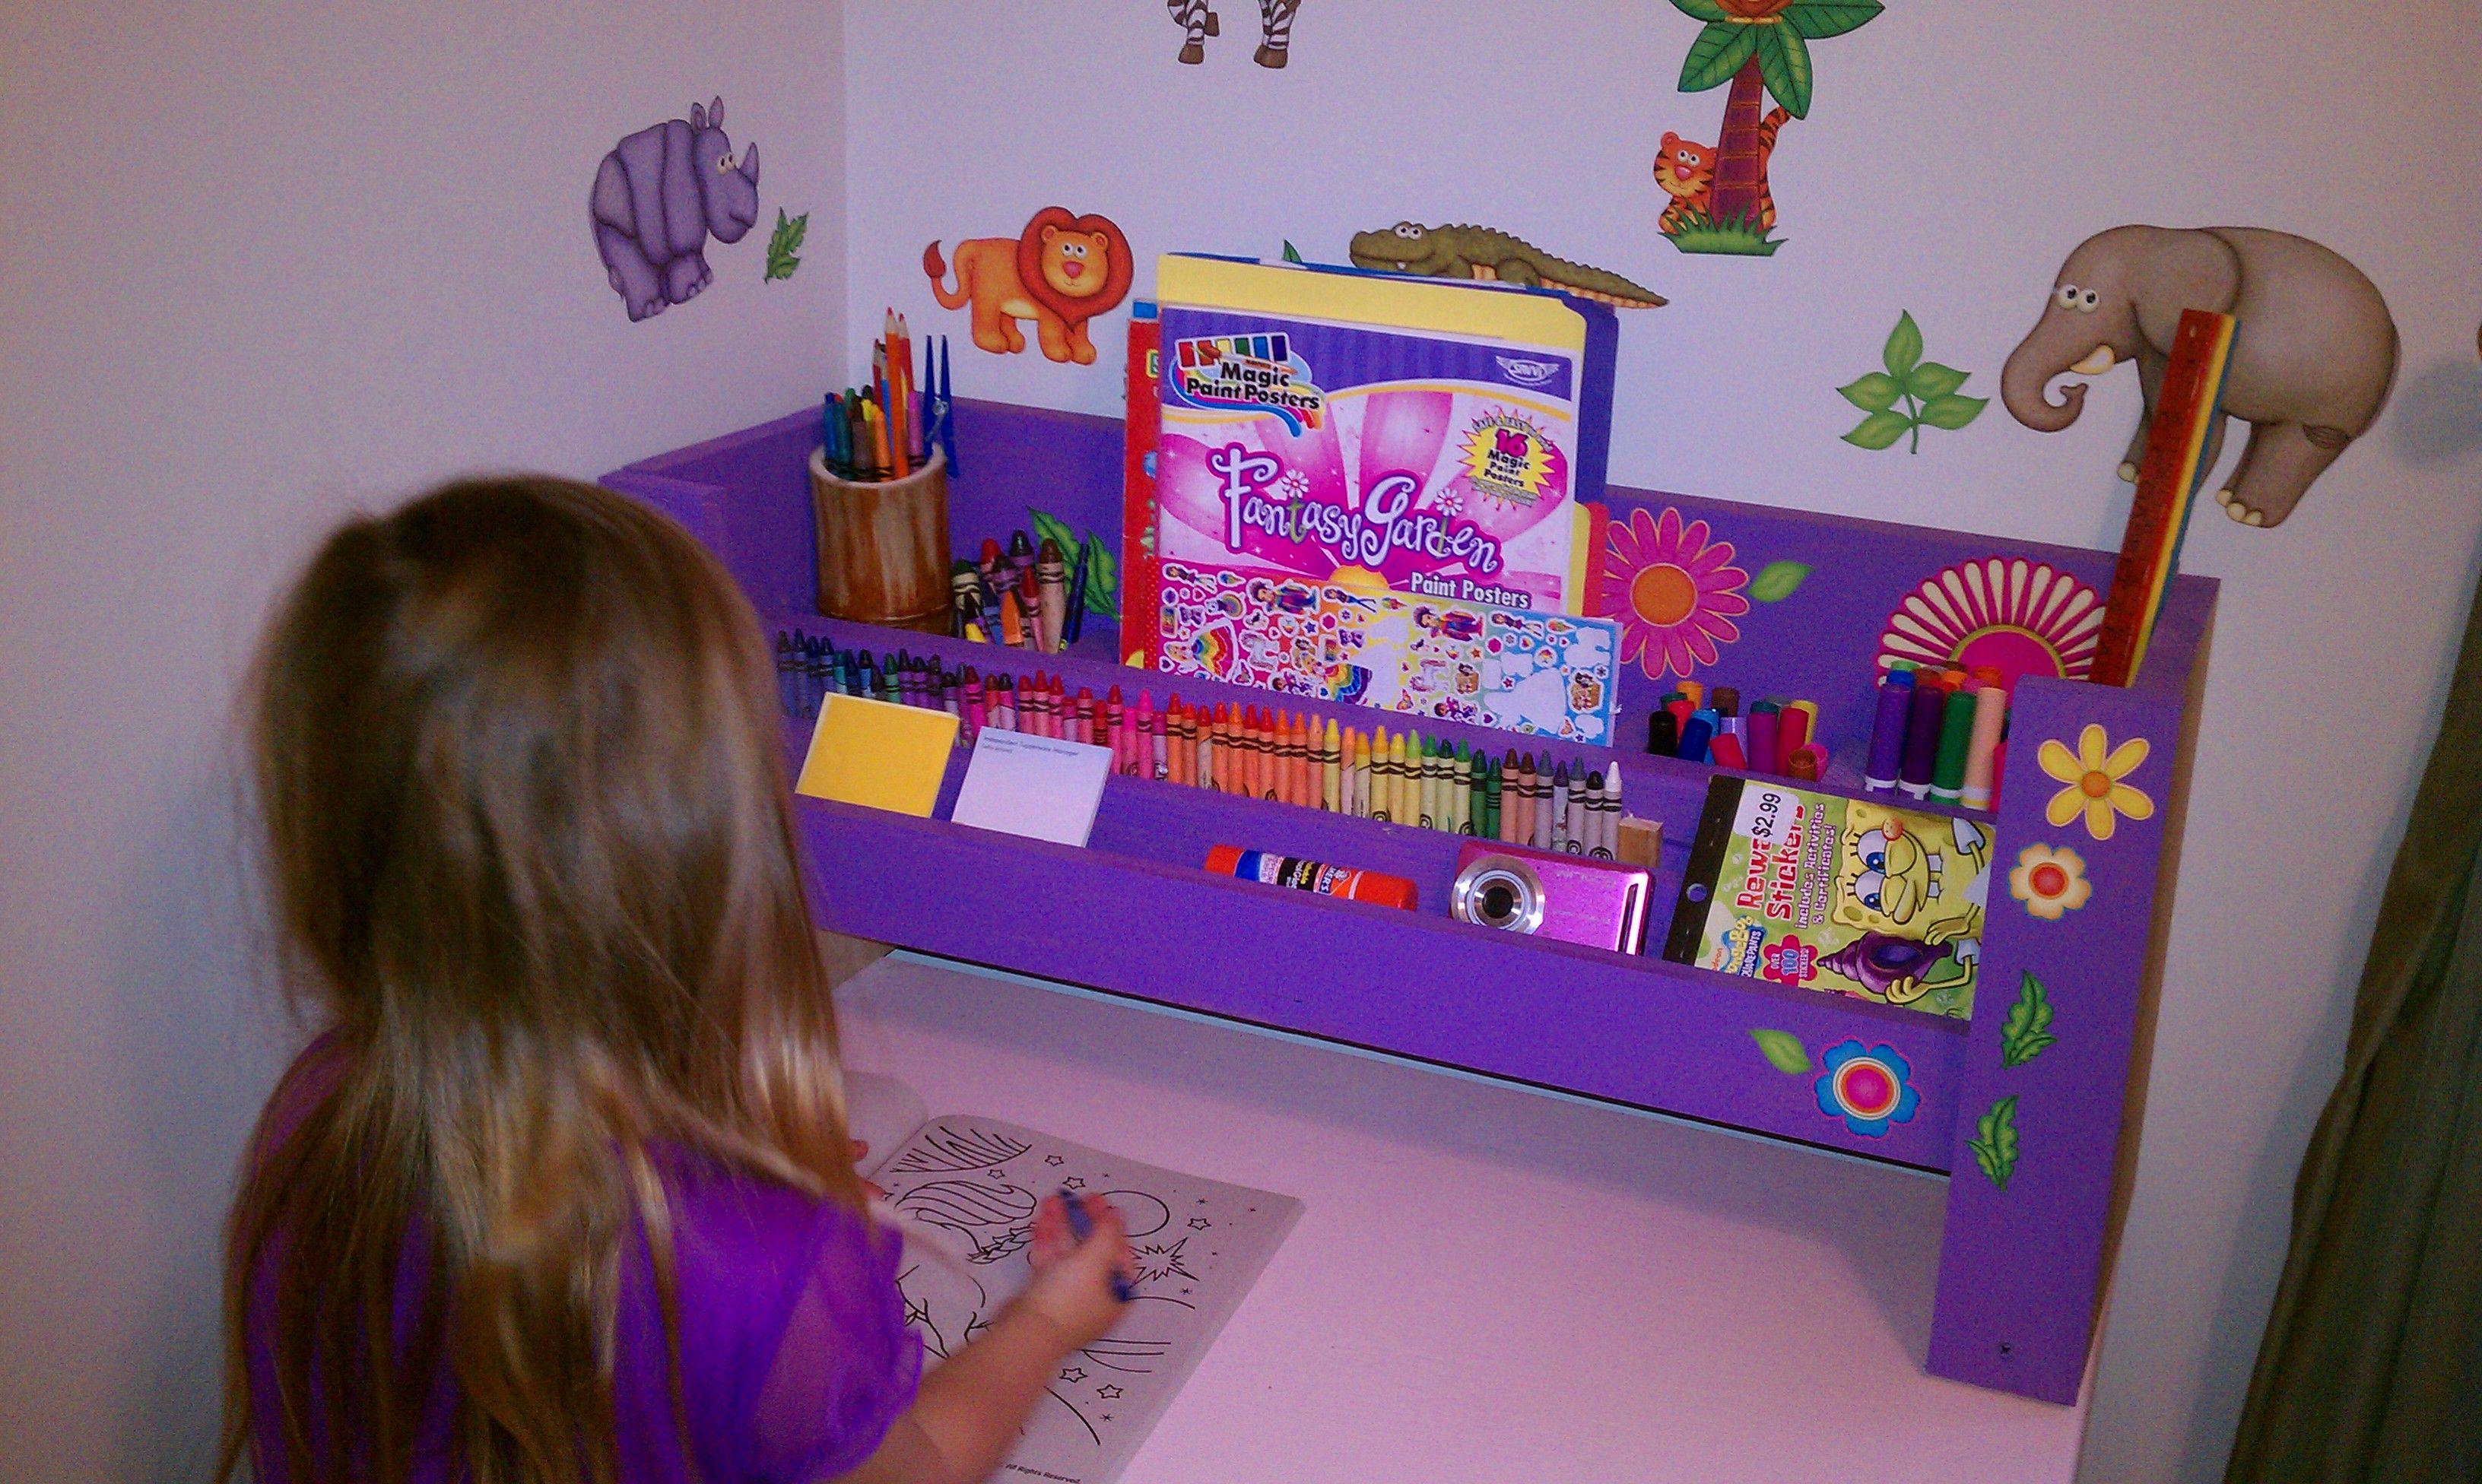 kids desk organizer organisieren kids desk organization desk rh pinterest com